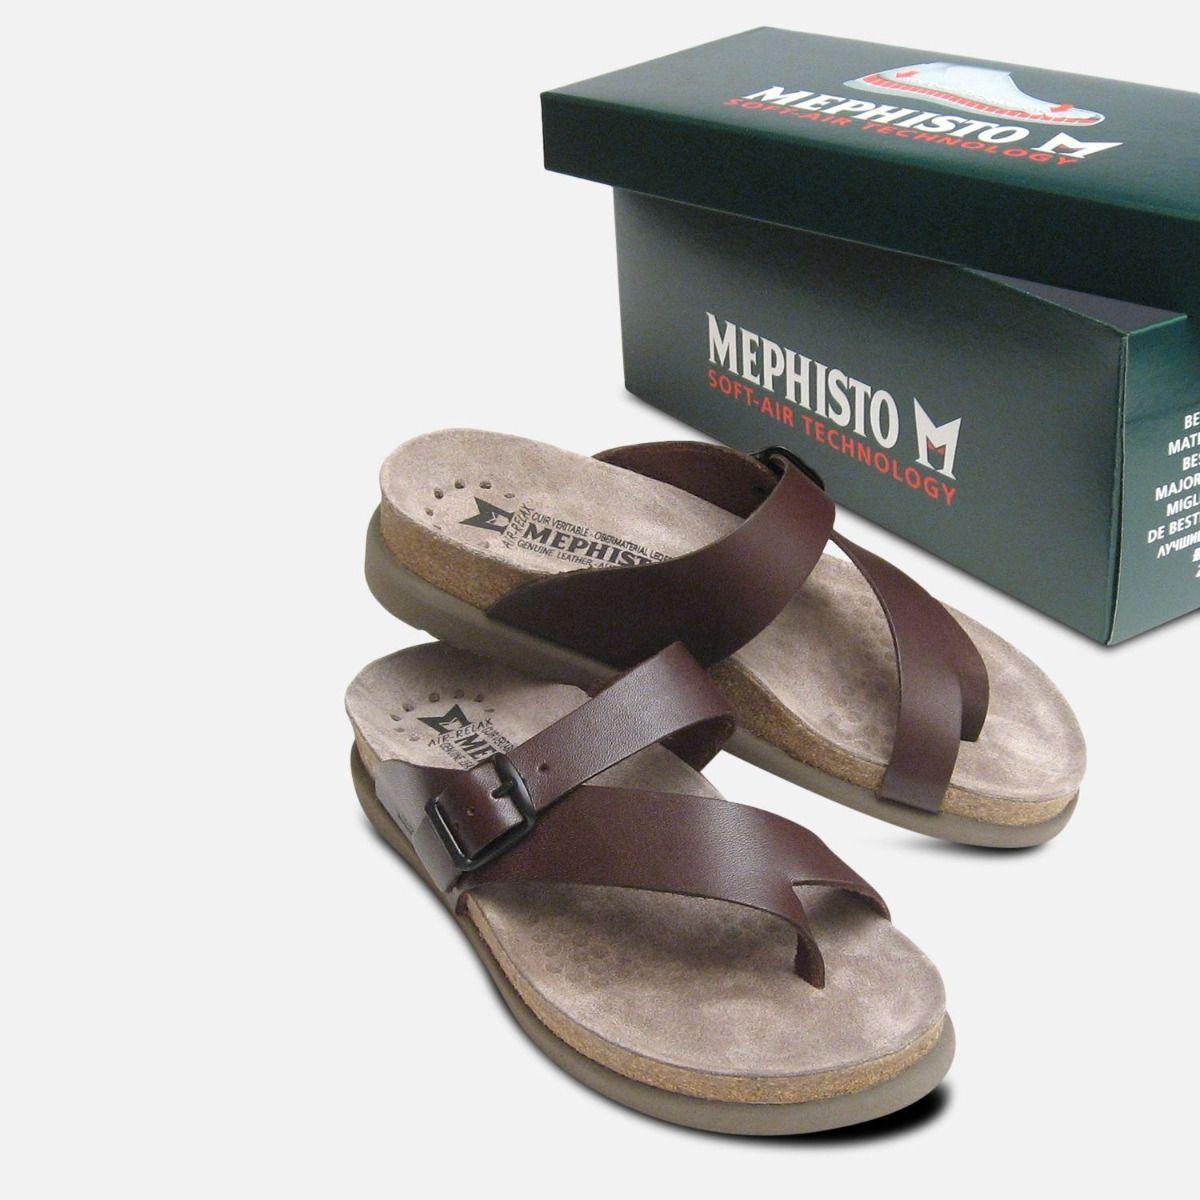 Chestnut Helen Shoes Leather Sandals Calf Brown Mephisto dCrxoeBW